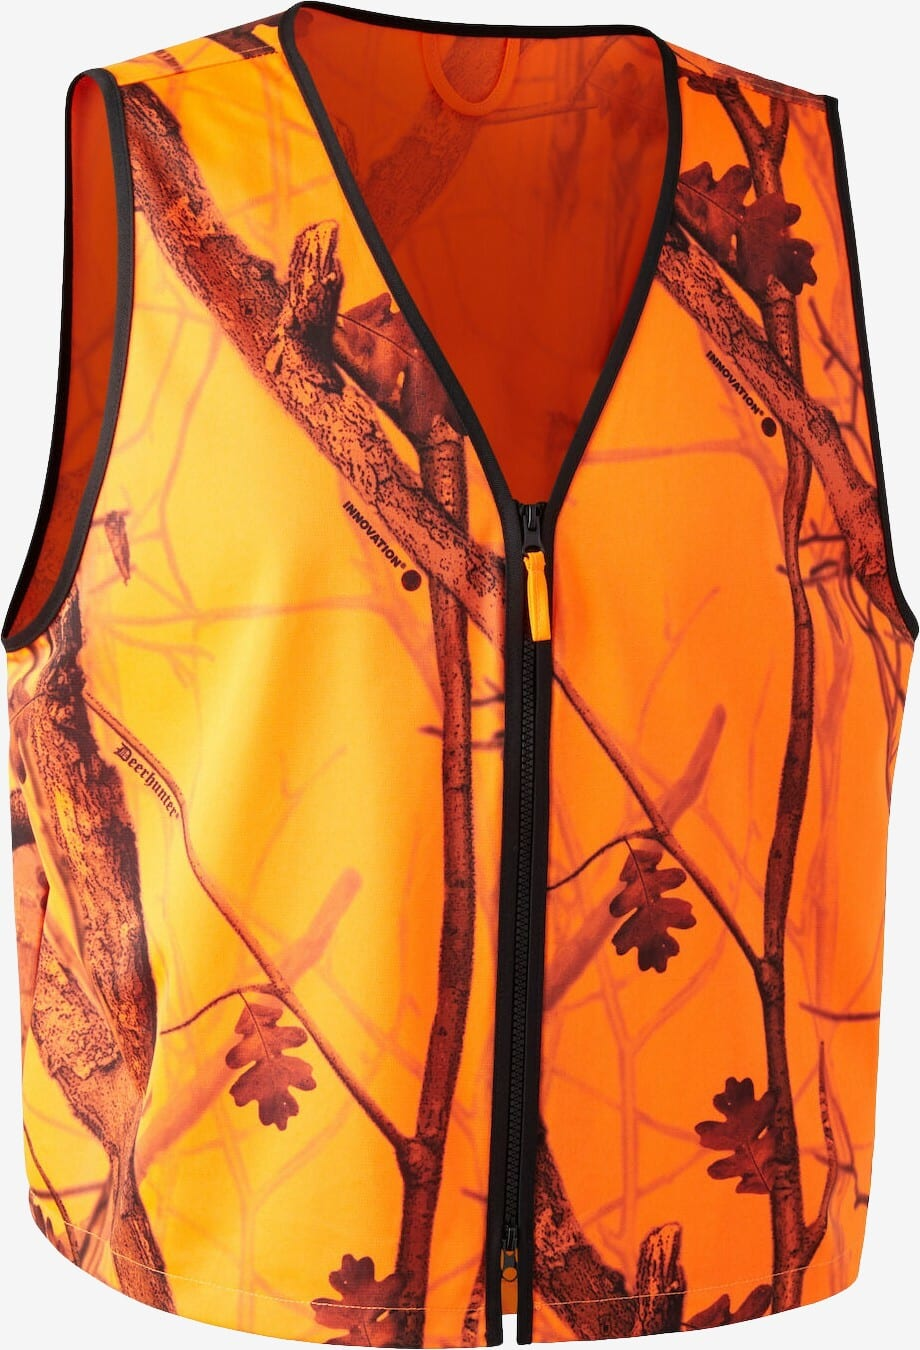 Deerhunter - Protector pull-over vest (Orange GH Camo)